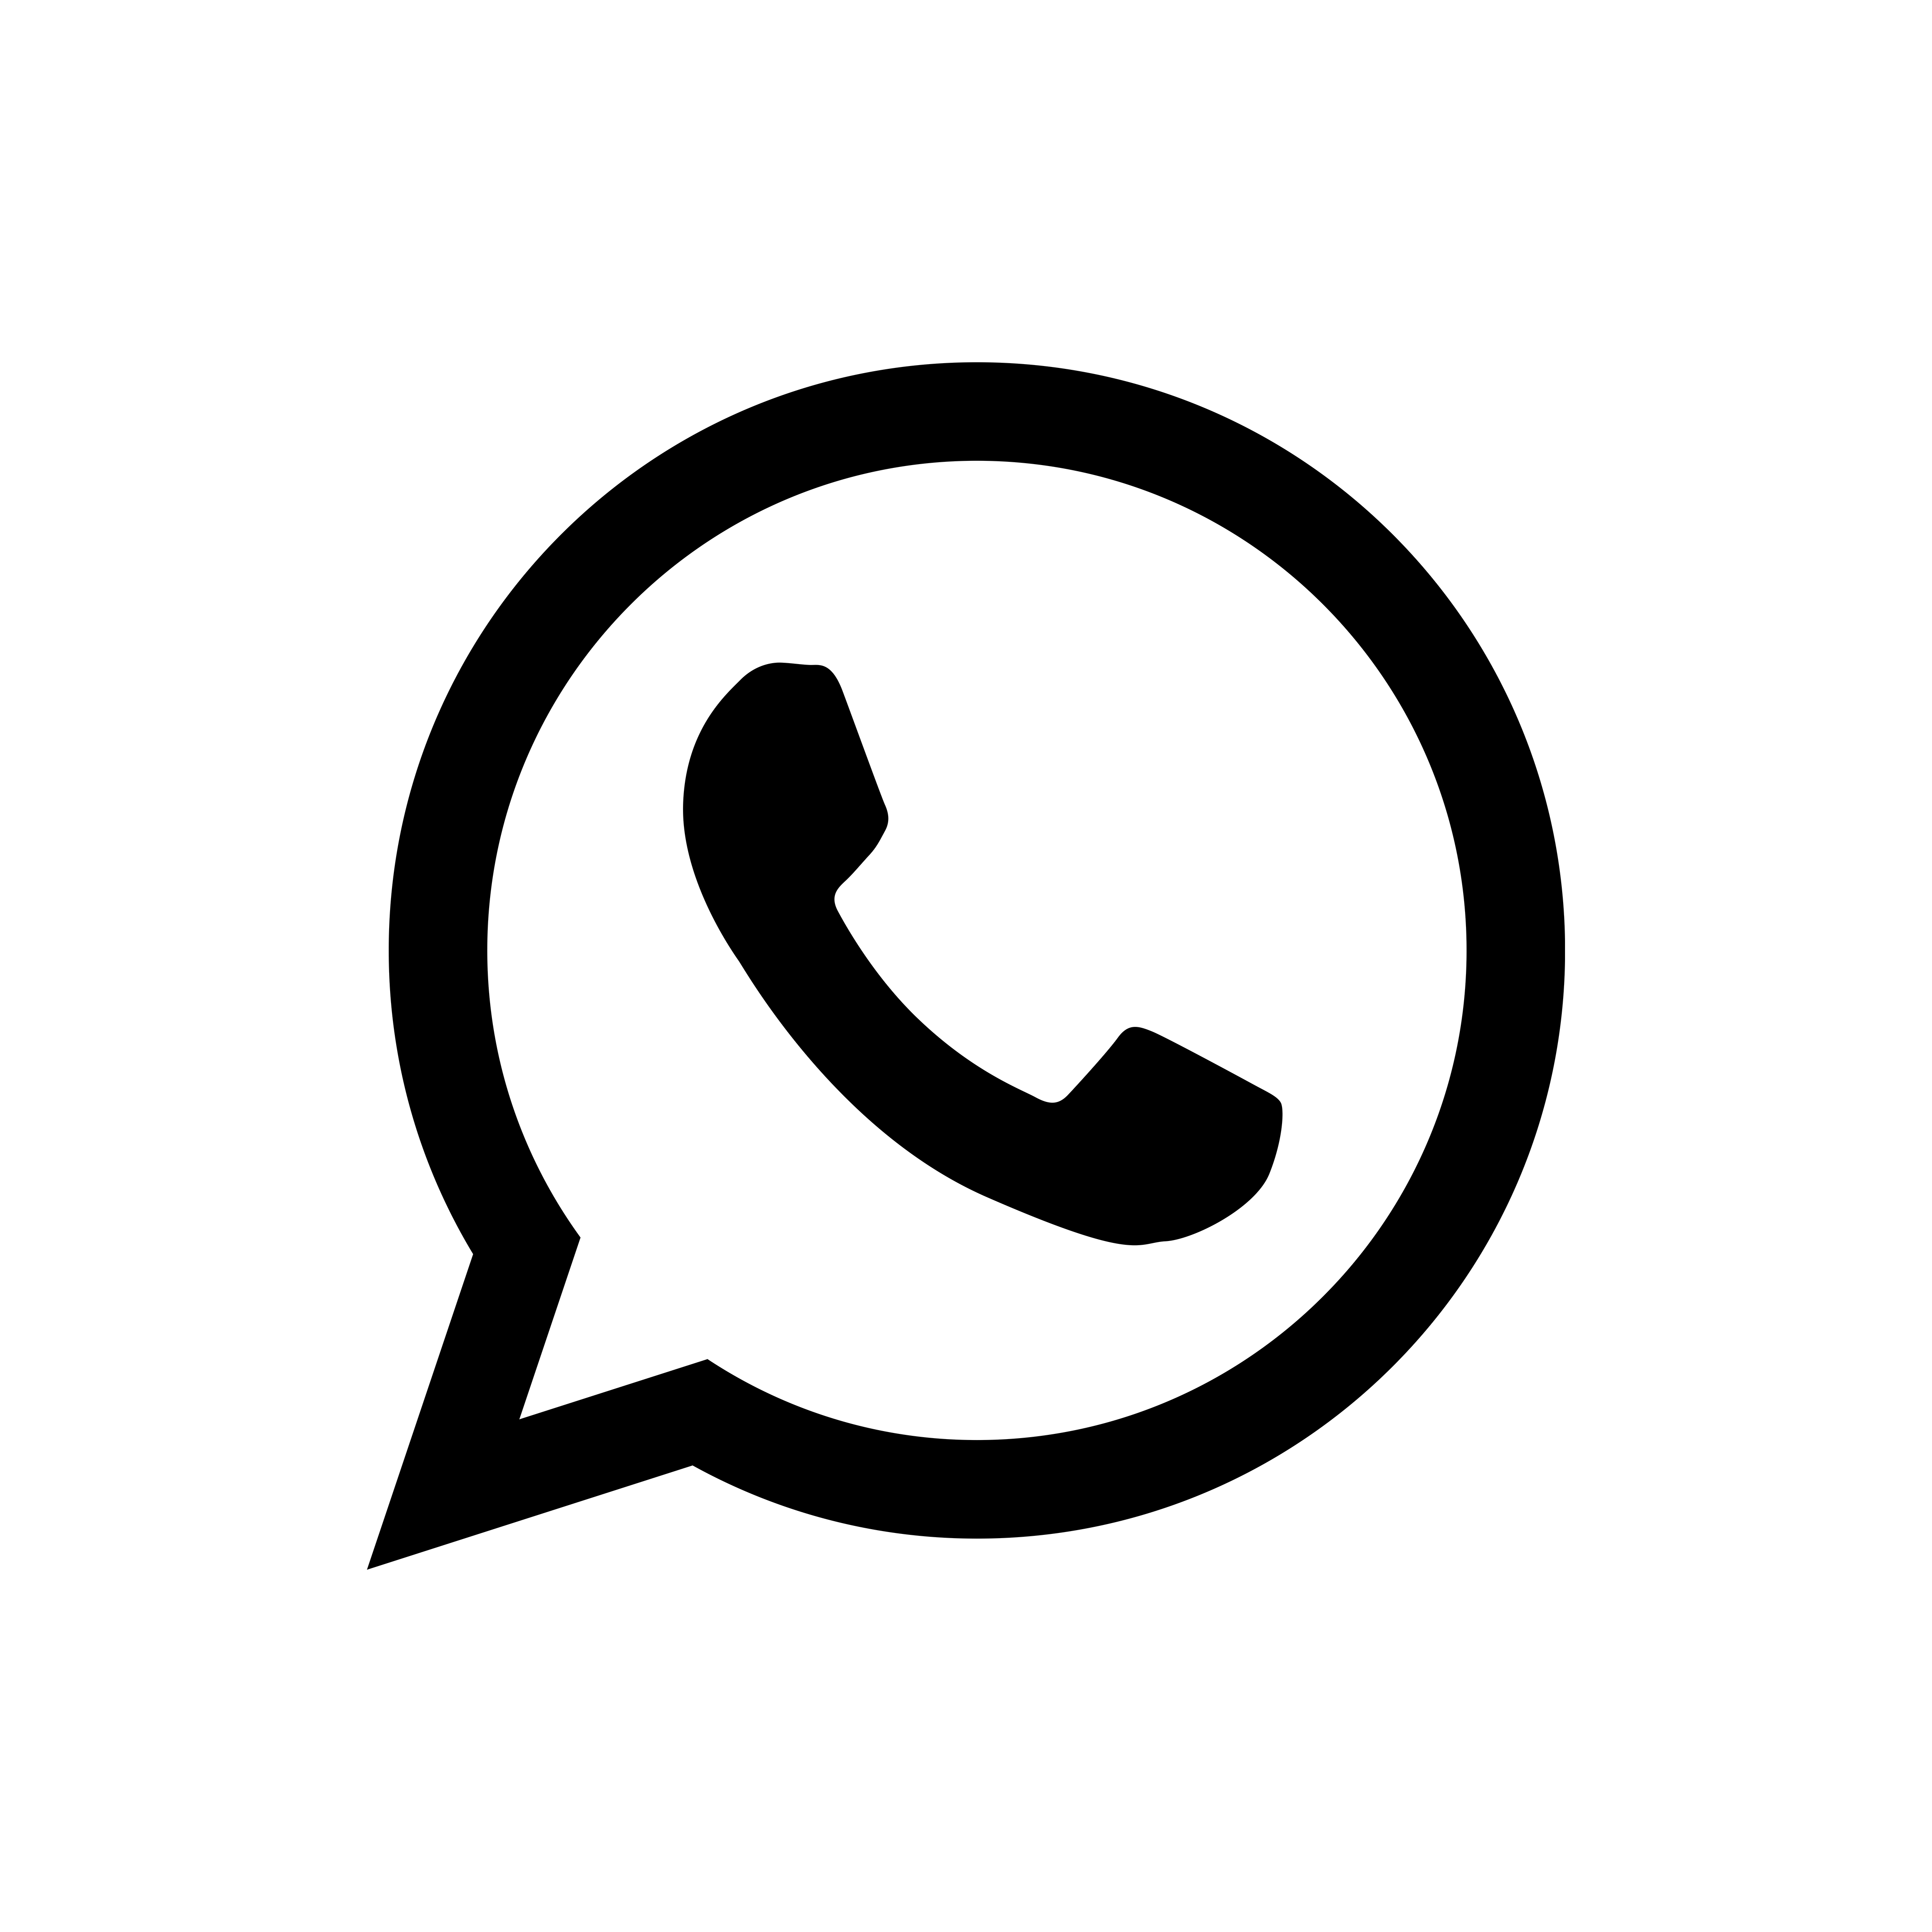 black, whatsapp icon   Simple Icons icon sets   Icon Ninja